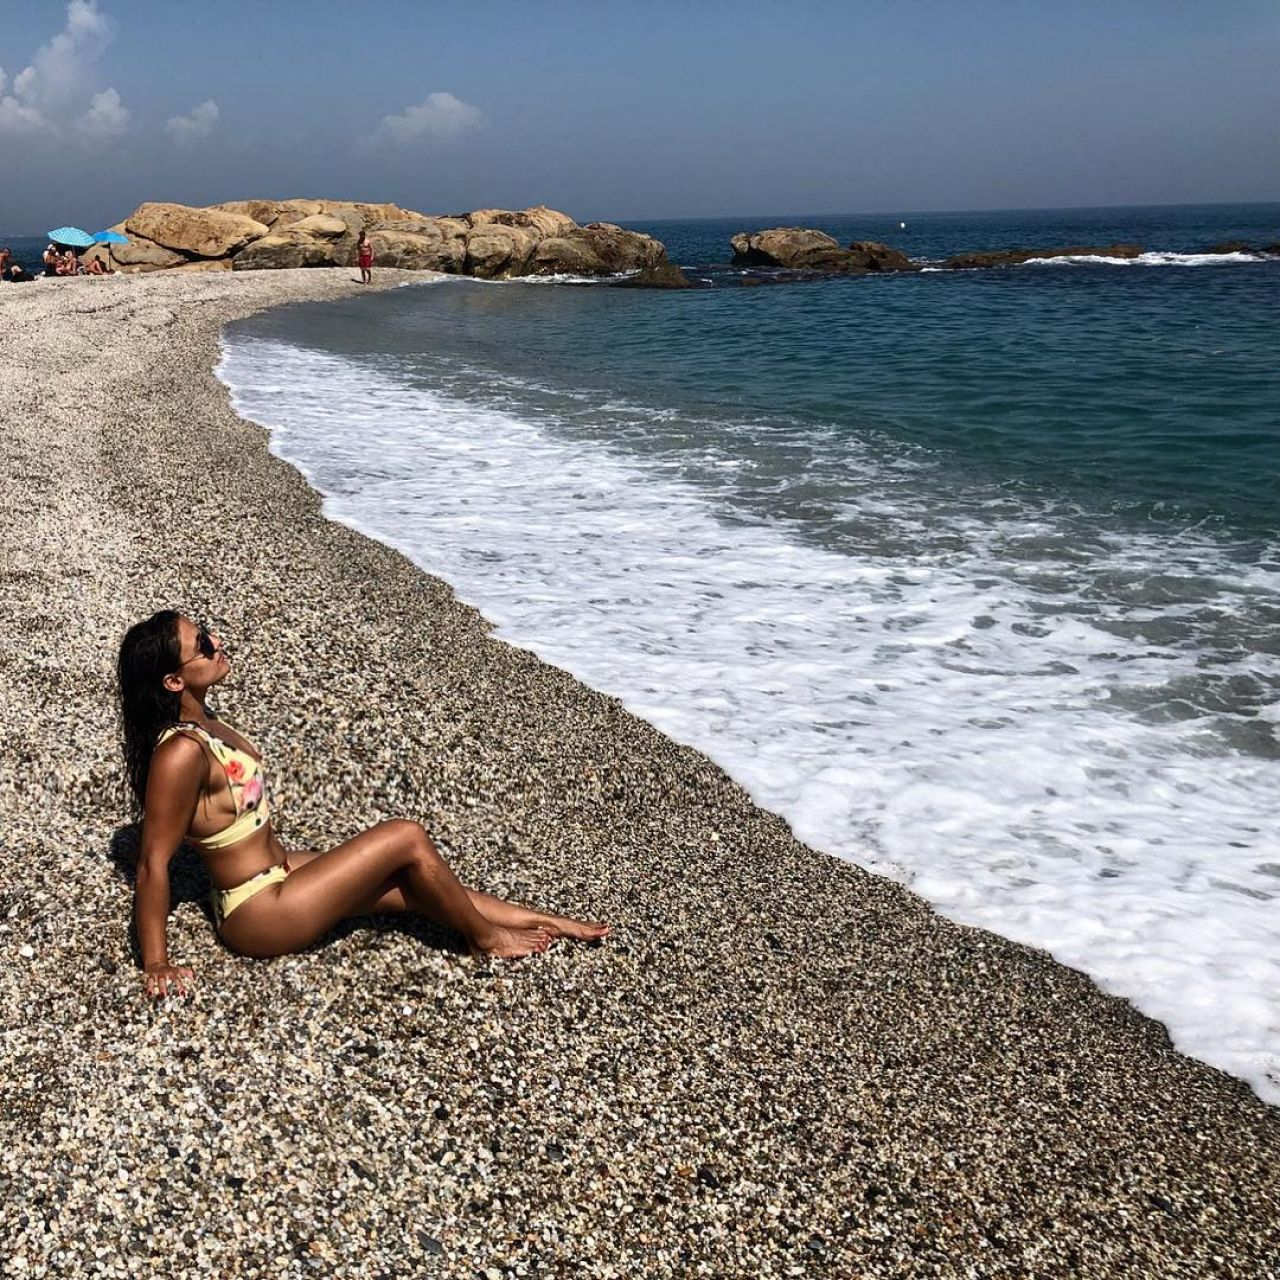 Susianna Kentikian – Personal Pics 01/08/2019